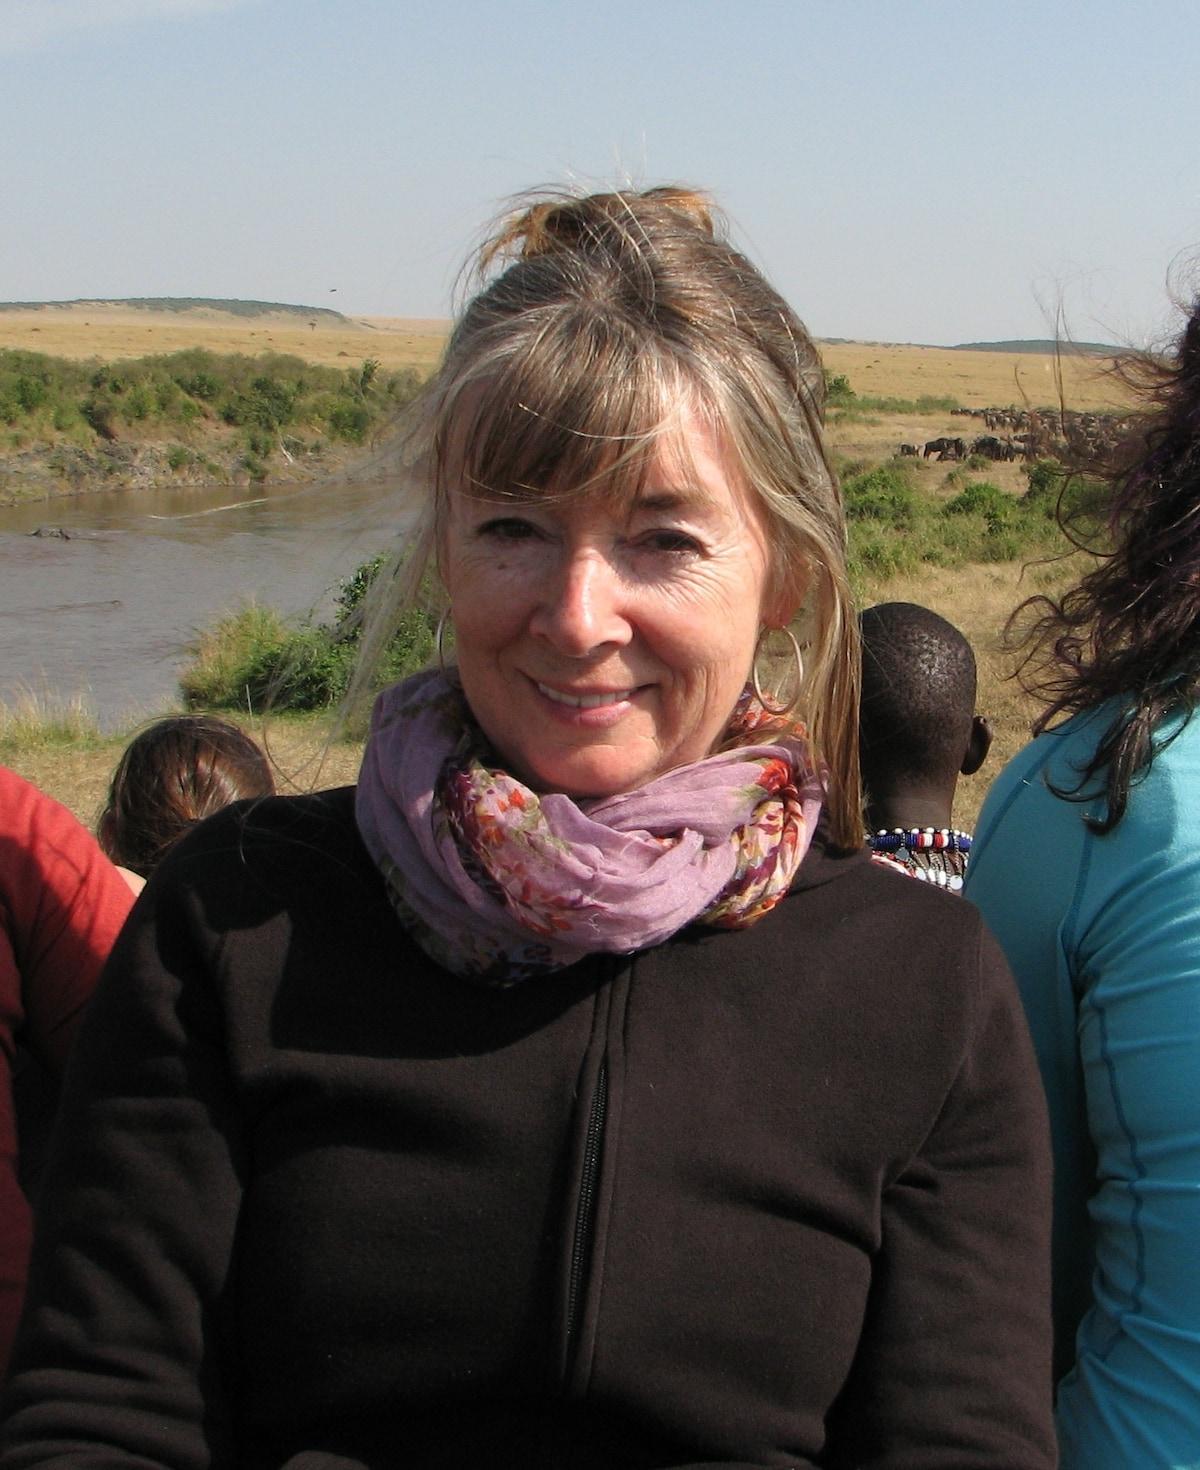 Linda from Comox-Strathcona J